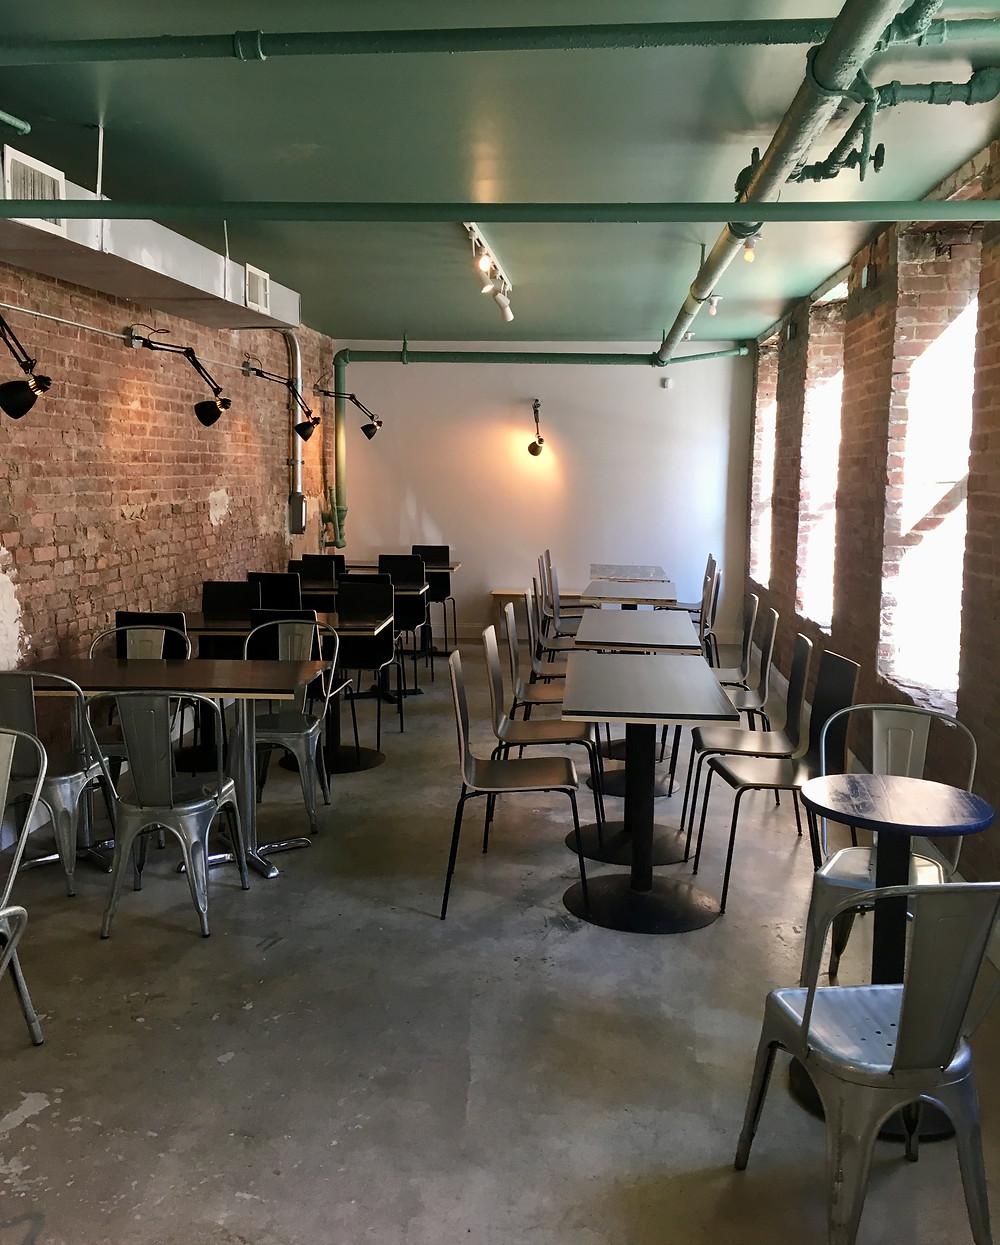 Taszo's newest location at 366 Audubon Avenue in Washington Heights